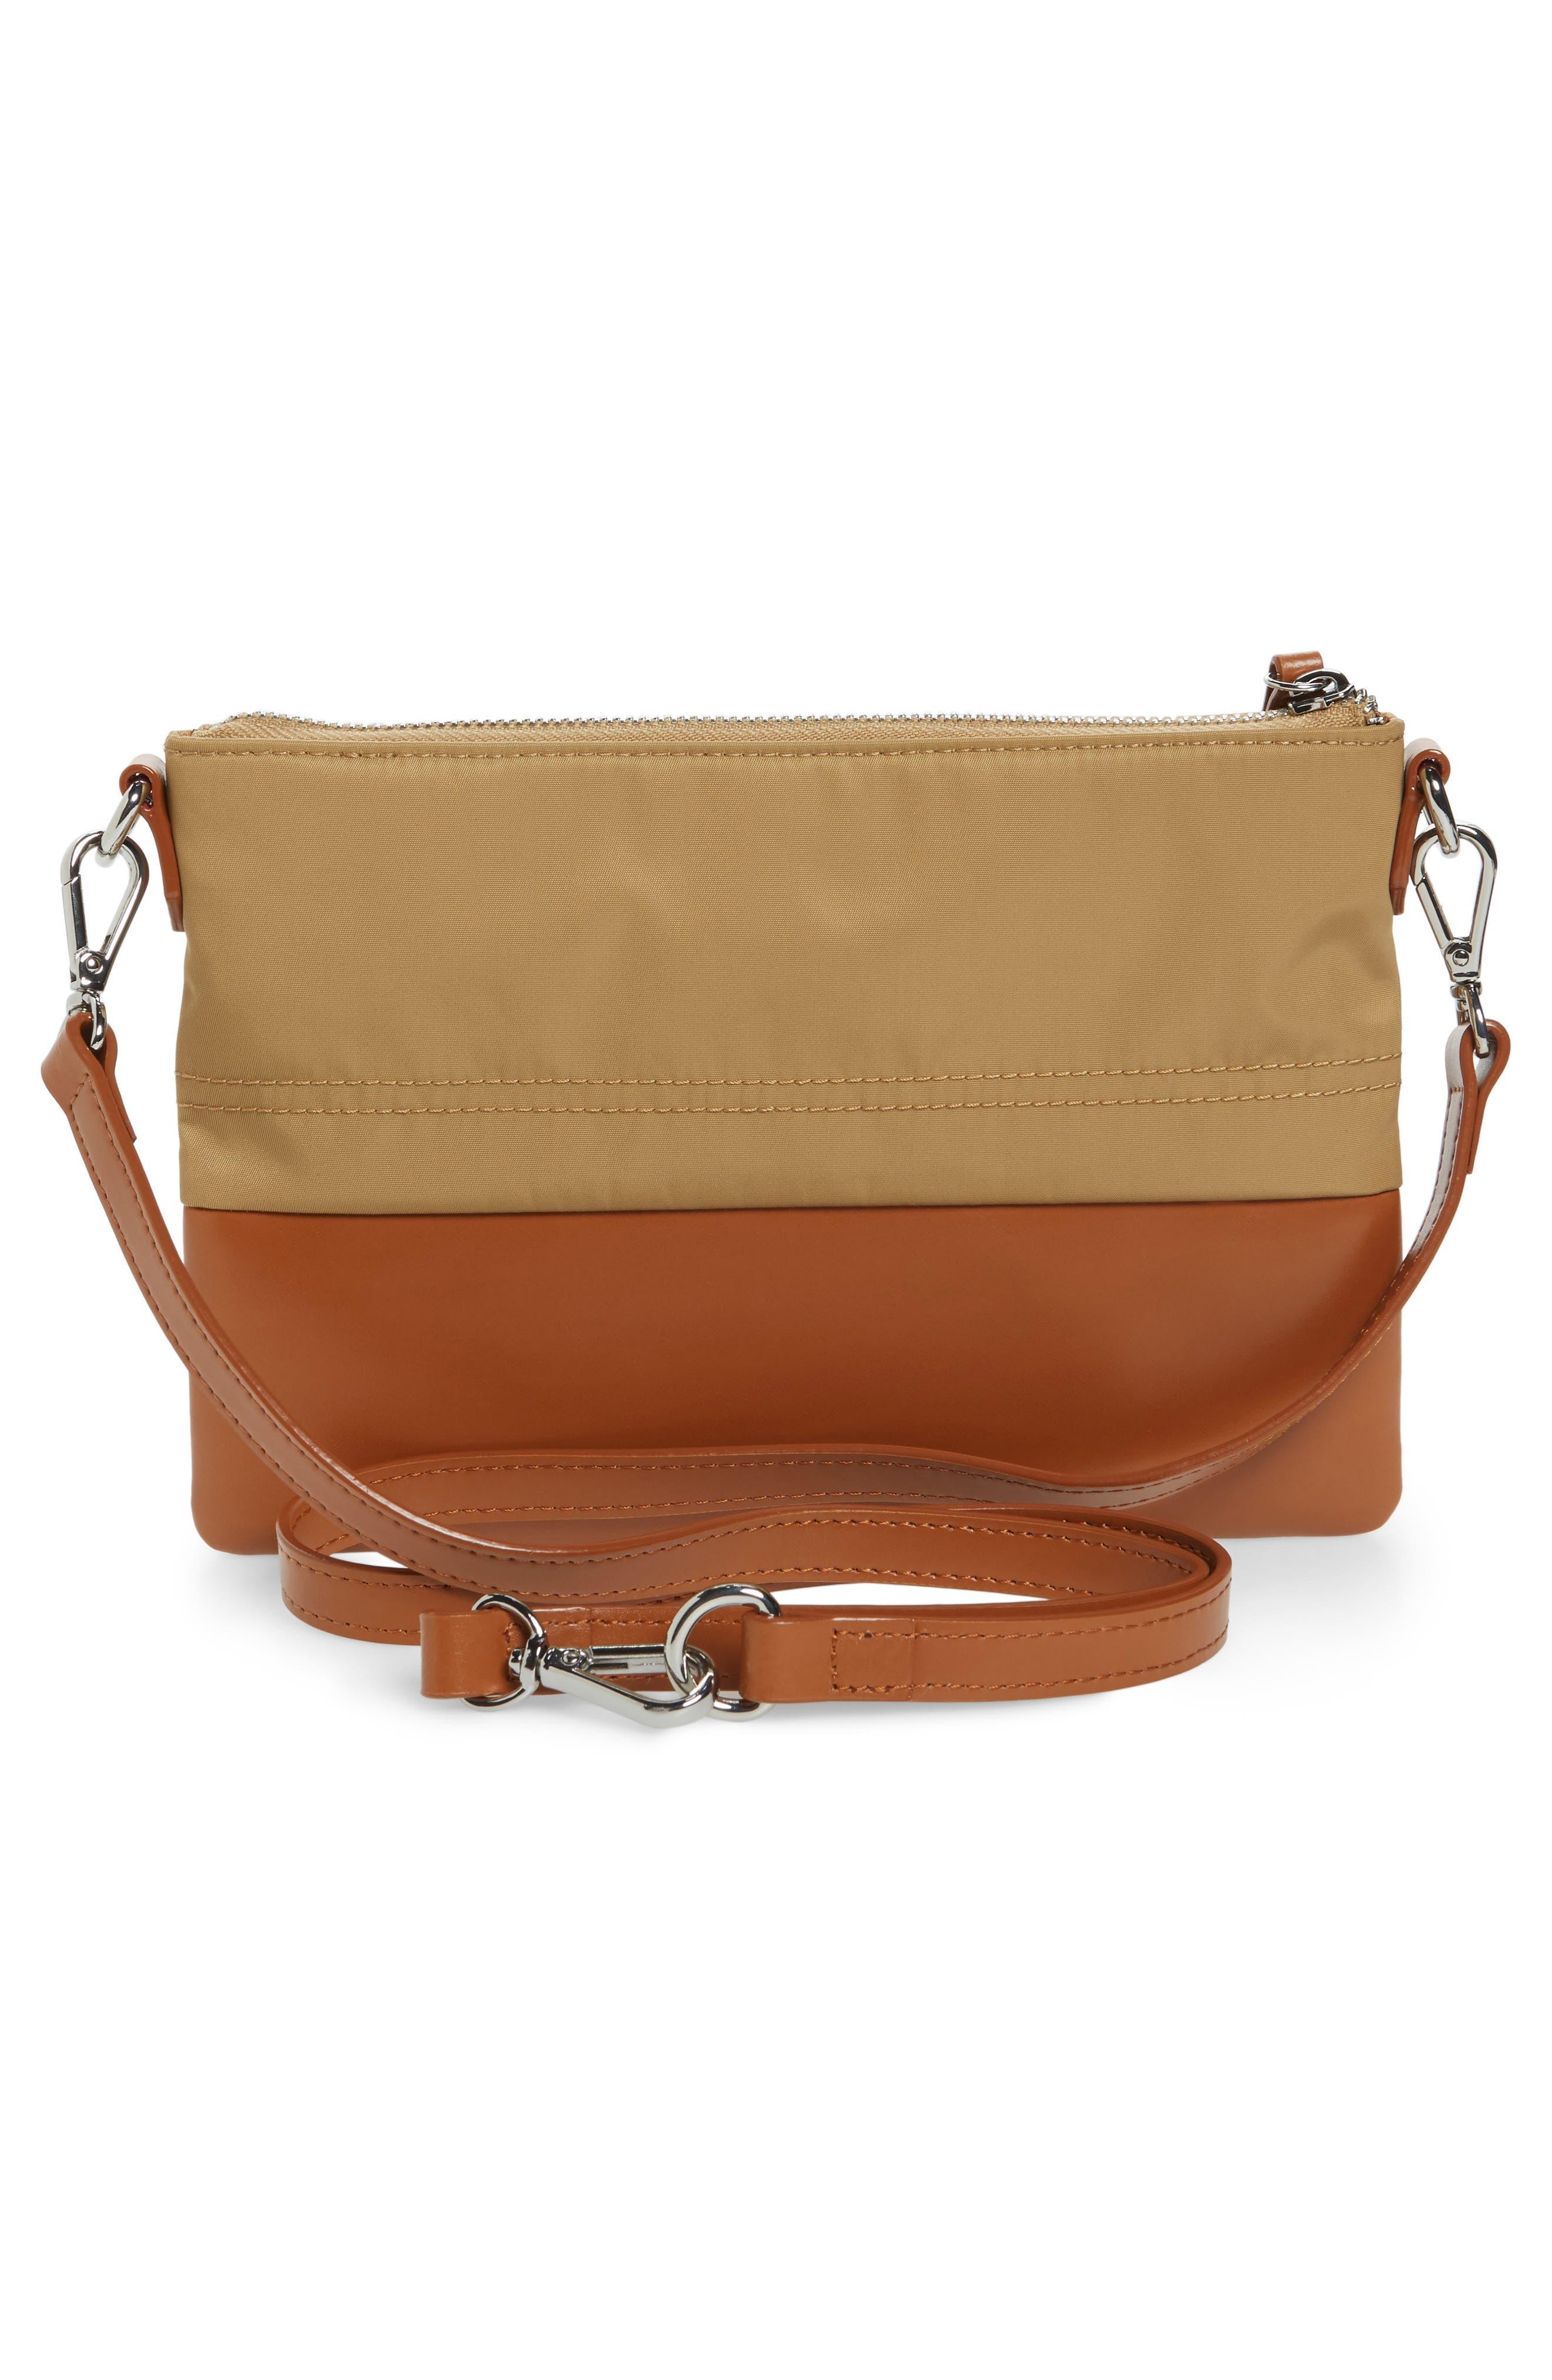 Alternate Image 2  - LODIS Los Angeles Kate Under Lock & Key Kala Leather Convertible Crossbody Bag